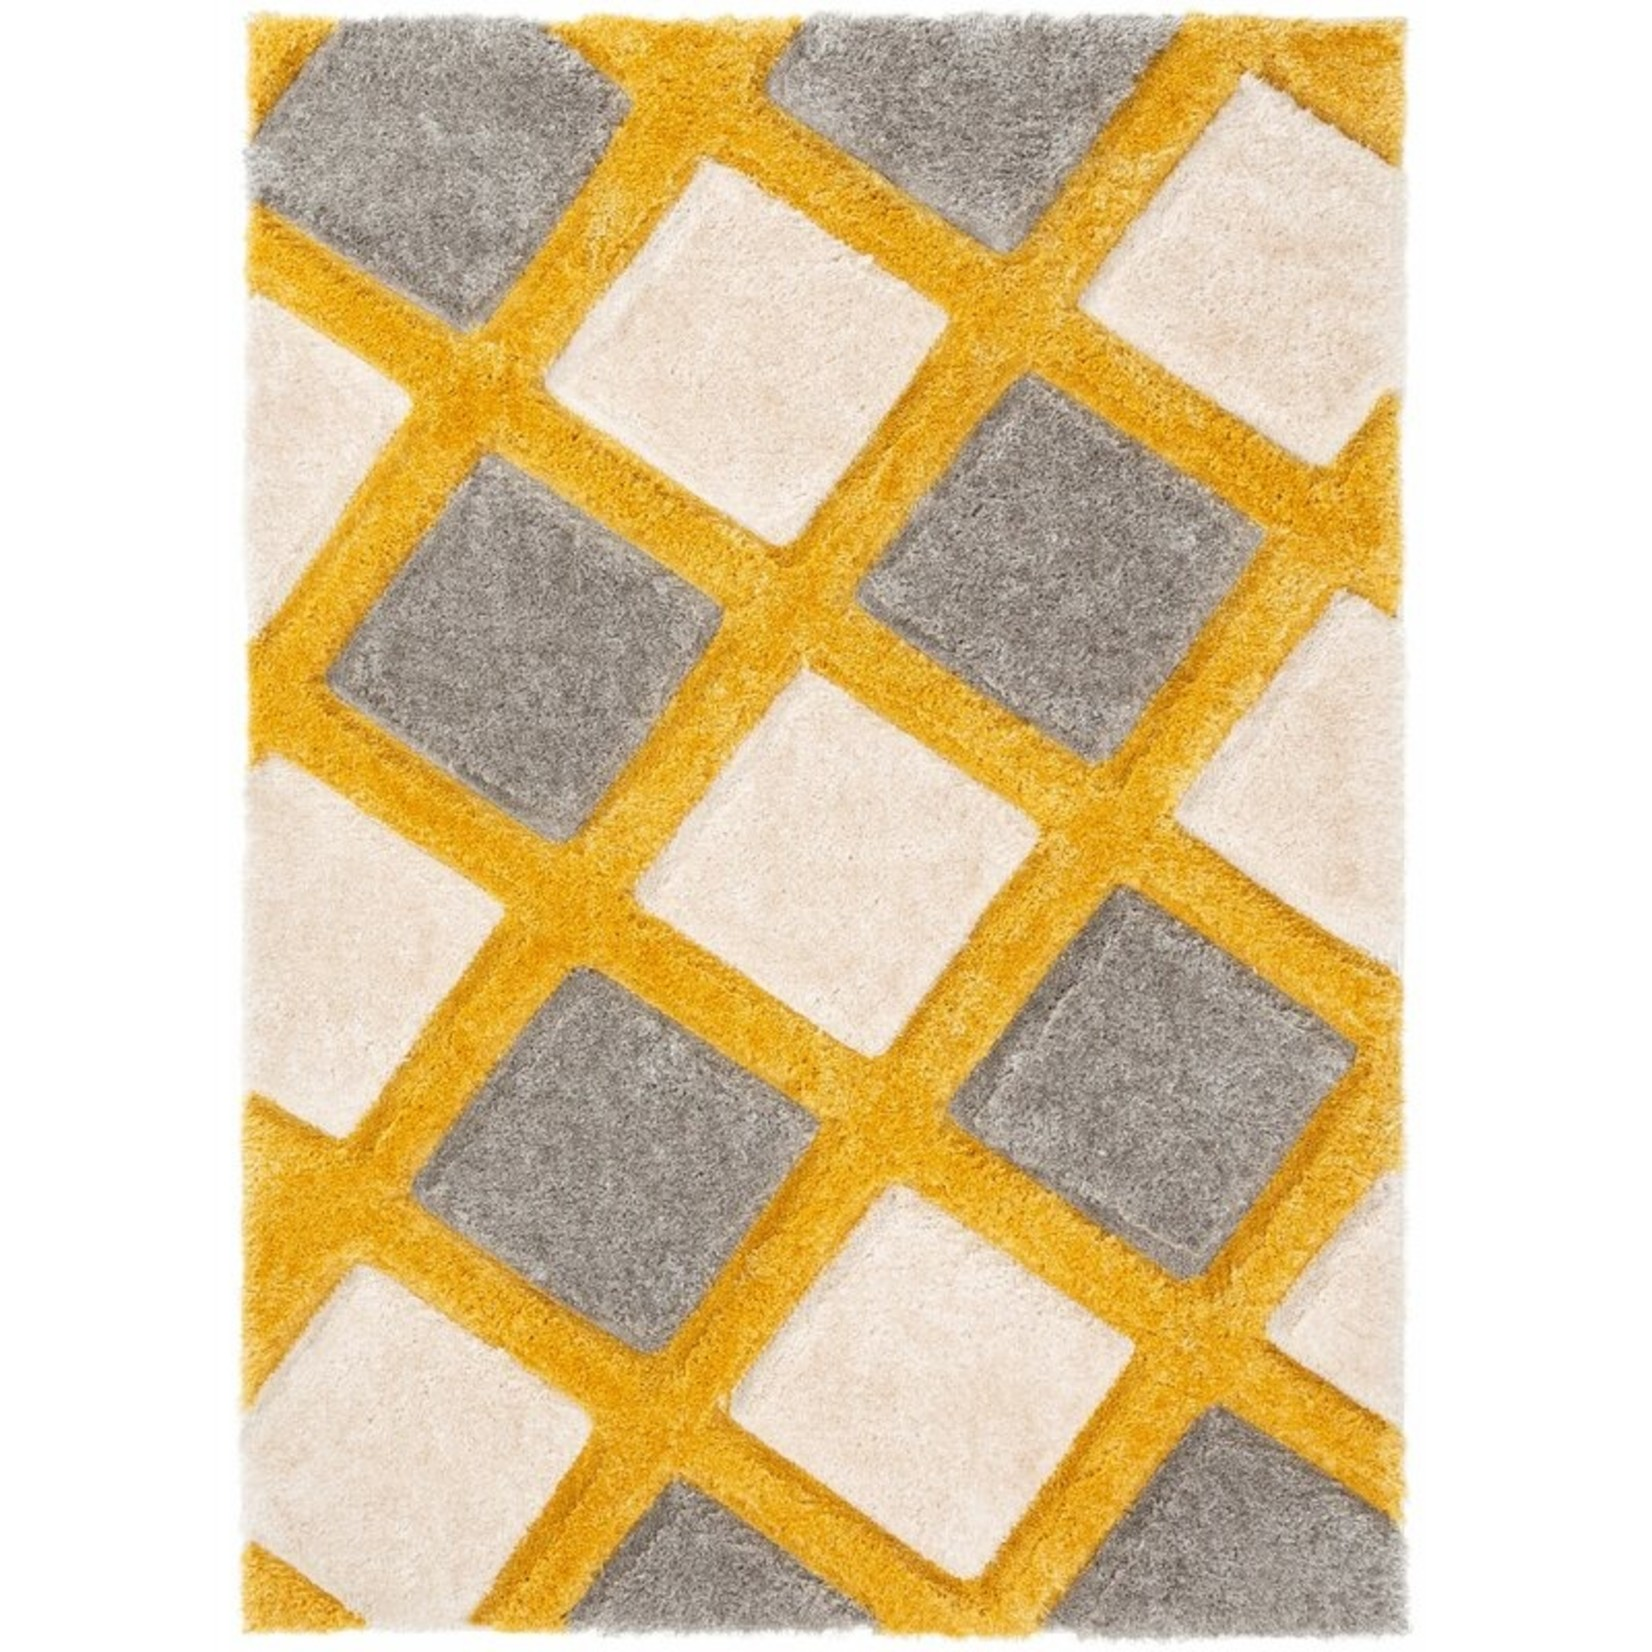 "*5'3"" x 7'3"" - San Francisco Shag Yellow/Gray Area Rug"